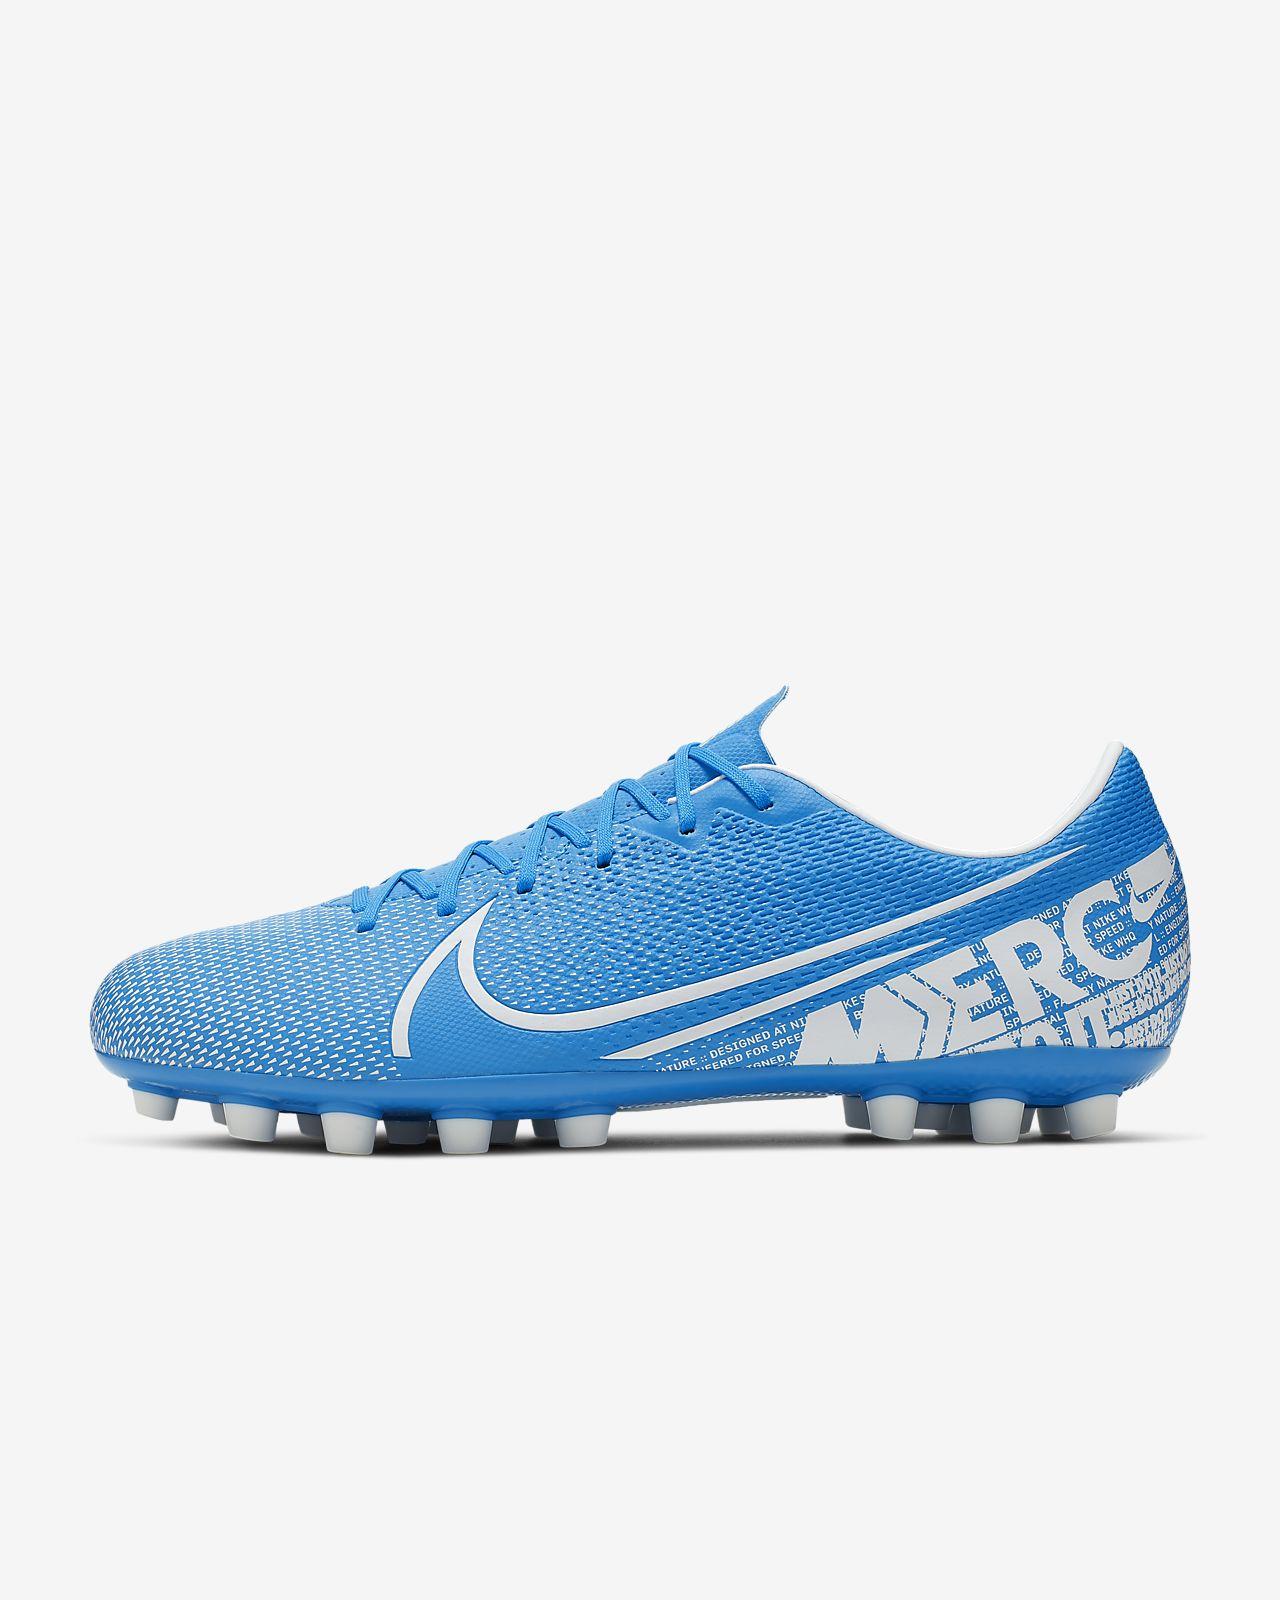 Nike Mercurial Vapor 13 Academy AG Artificial-Grass Football Boot